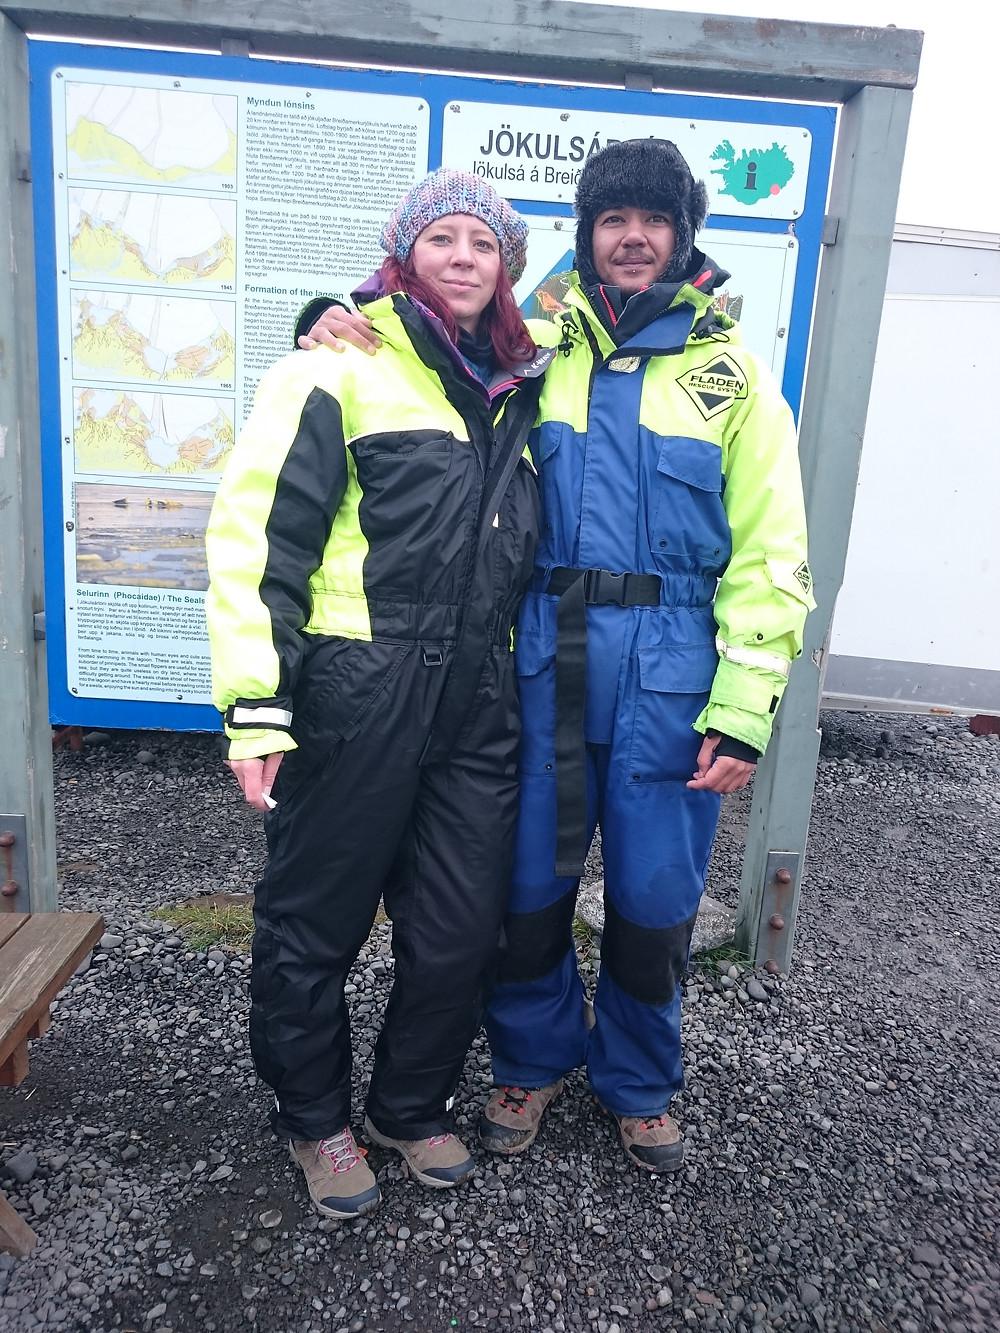 Jokulsarlon Glacial Lagoon Zodiac Tour onesies - Vagabond Journals